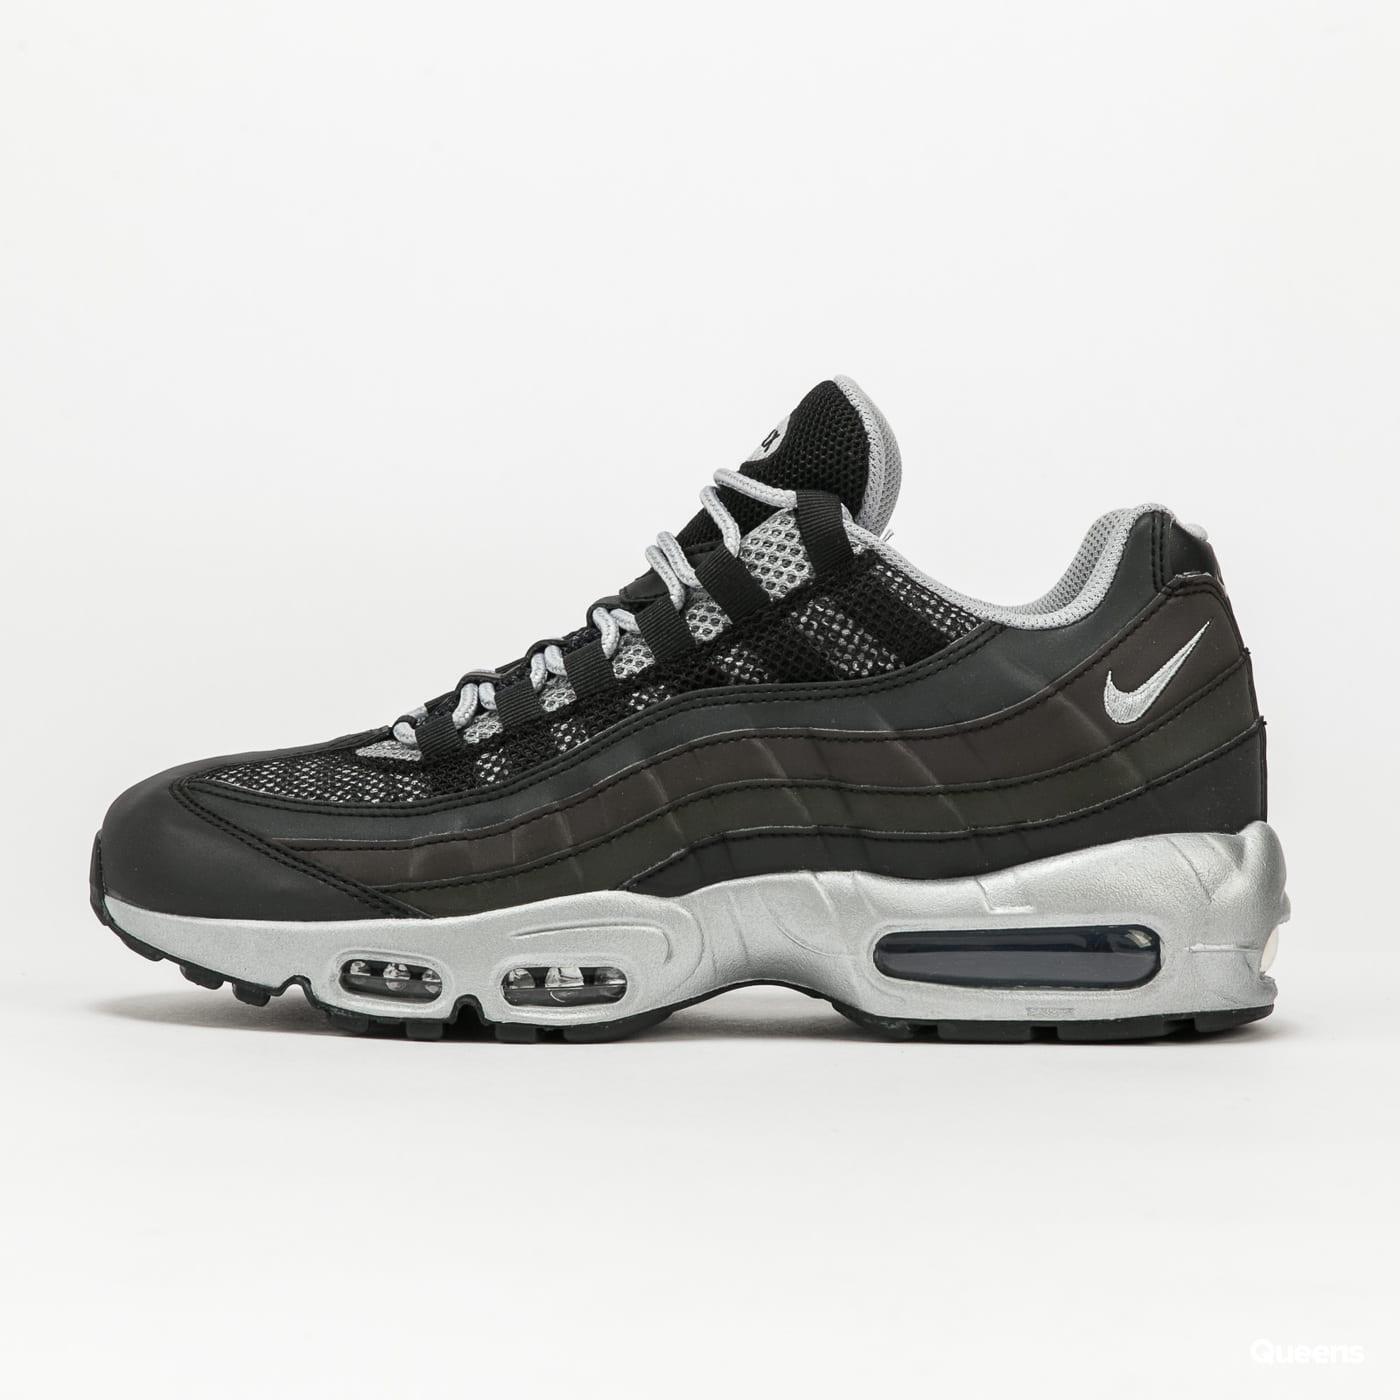 Nike Air Max 95 Premium black / metallic silver